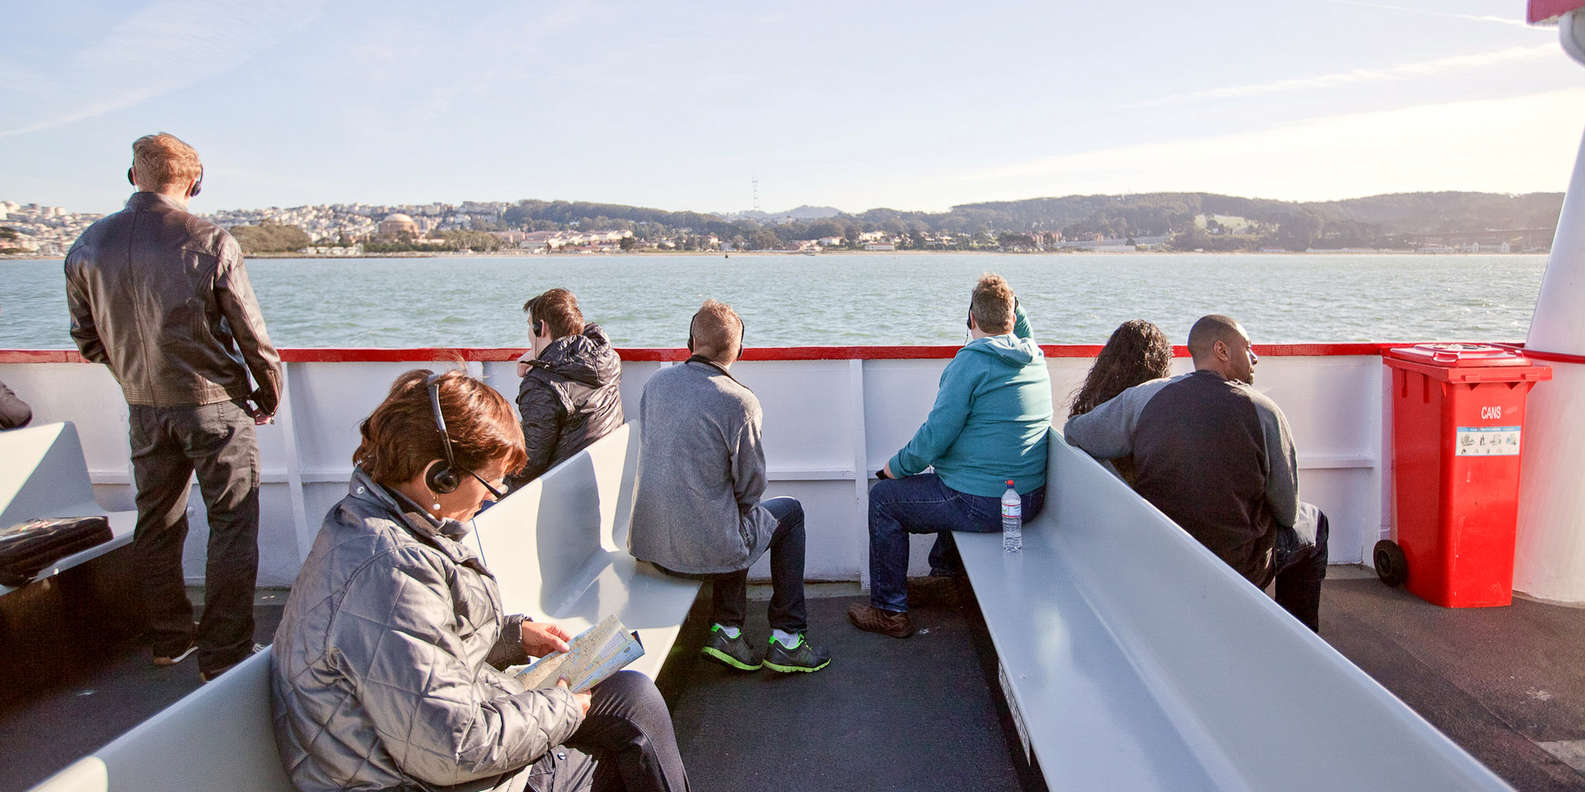 Bay Cruise to View the Golden Gate Bridge